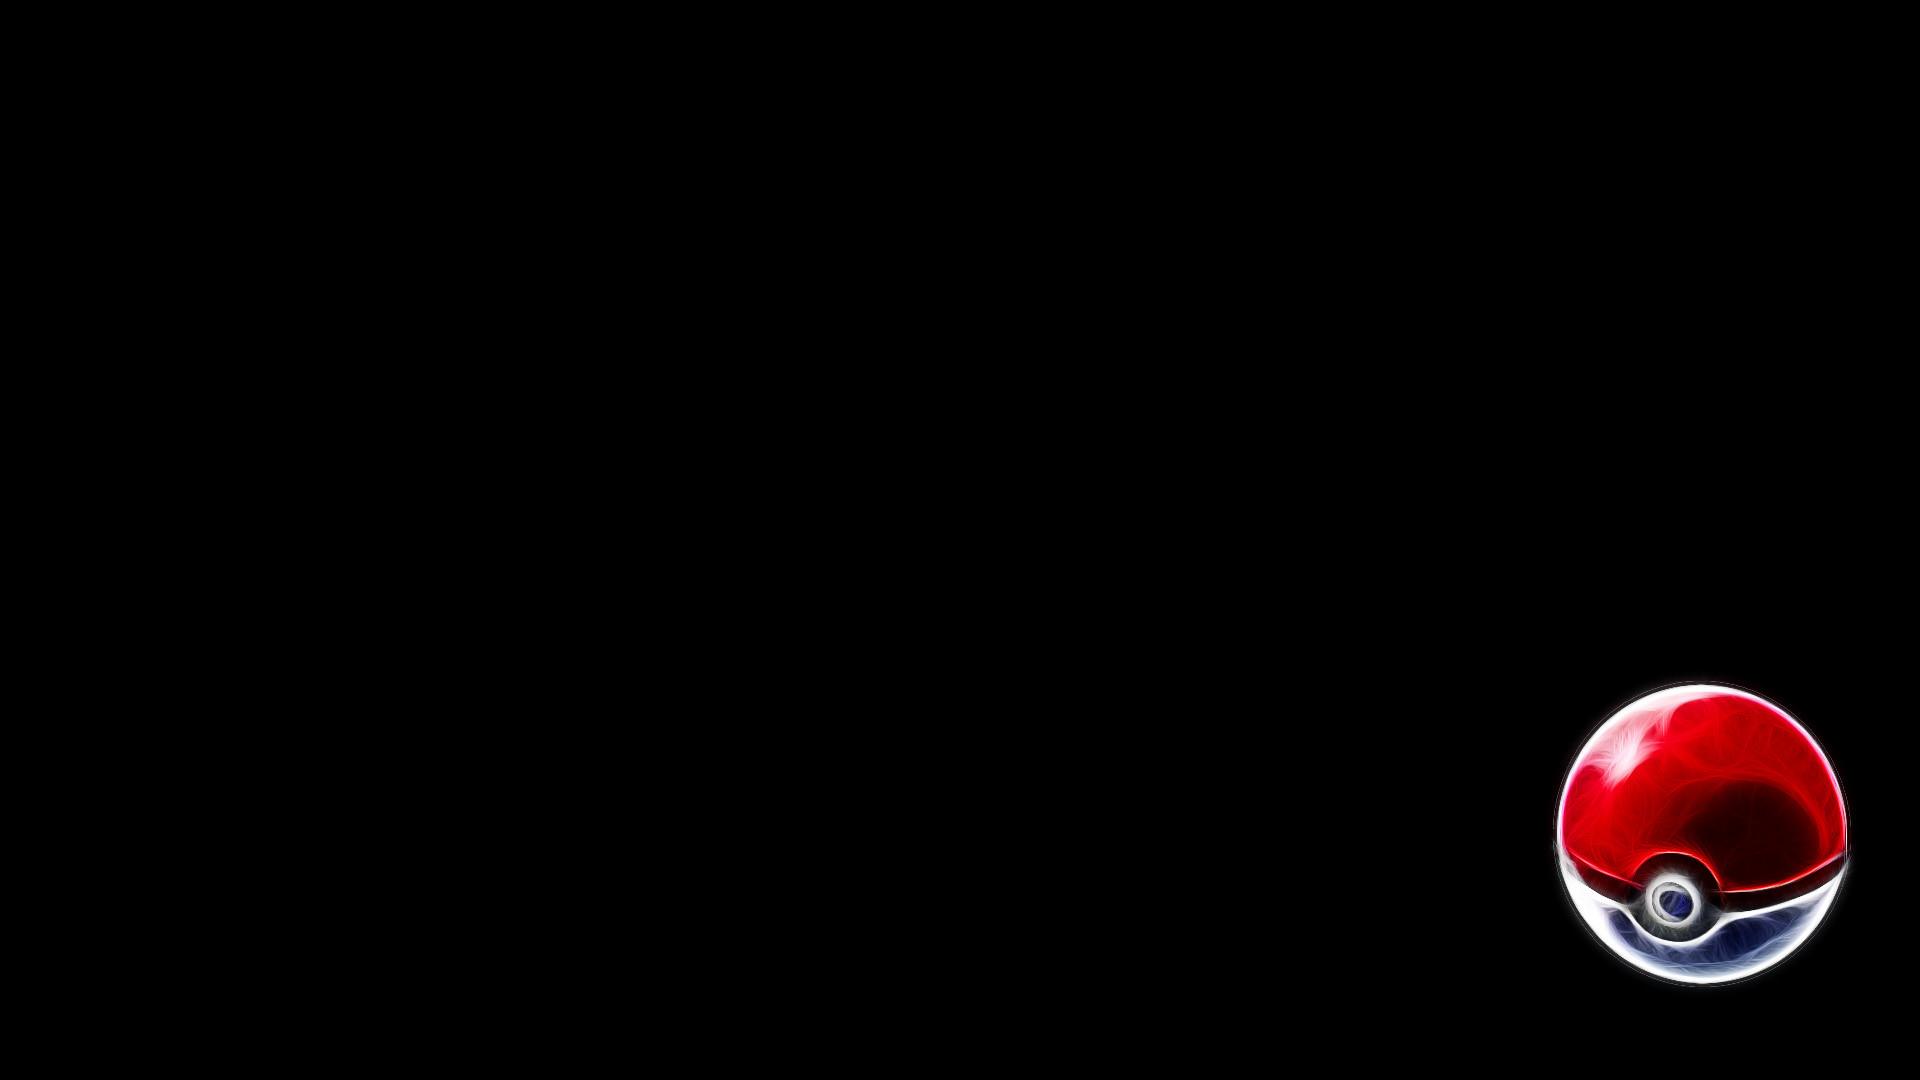 Eevee Pokeball Wallpaper Wallpapers logo pokeball